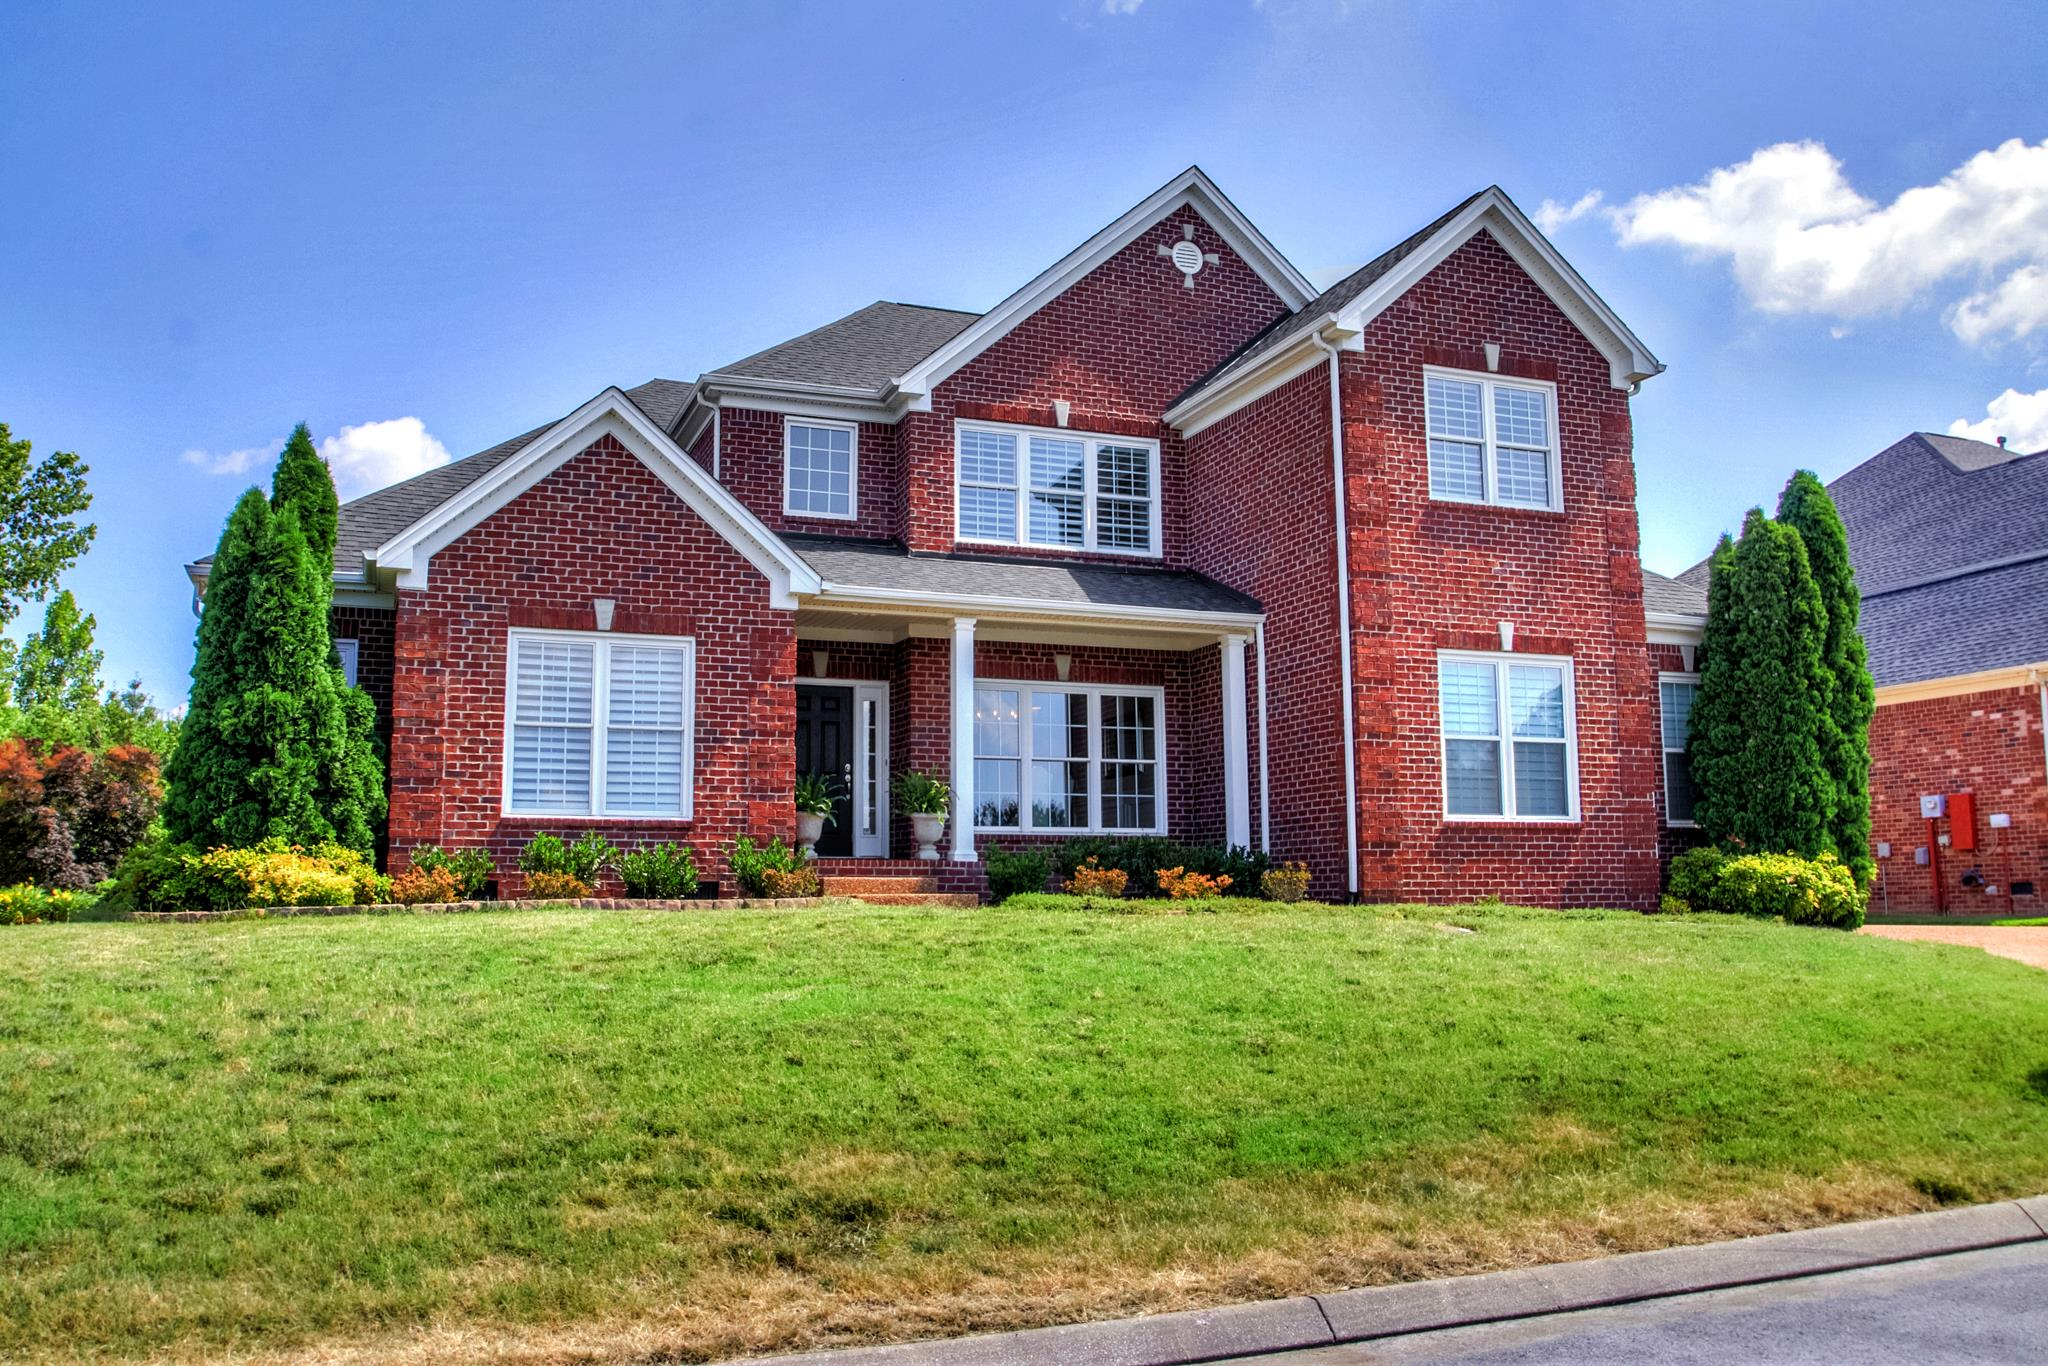 606 Elk Springs Ct, Franklin, TN 37069 - Franklin, TN real estate listing